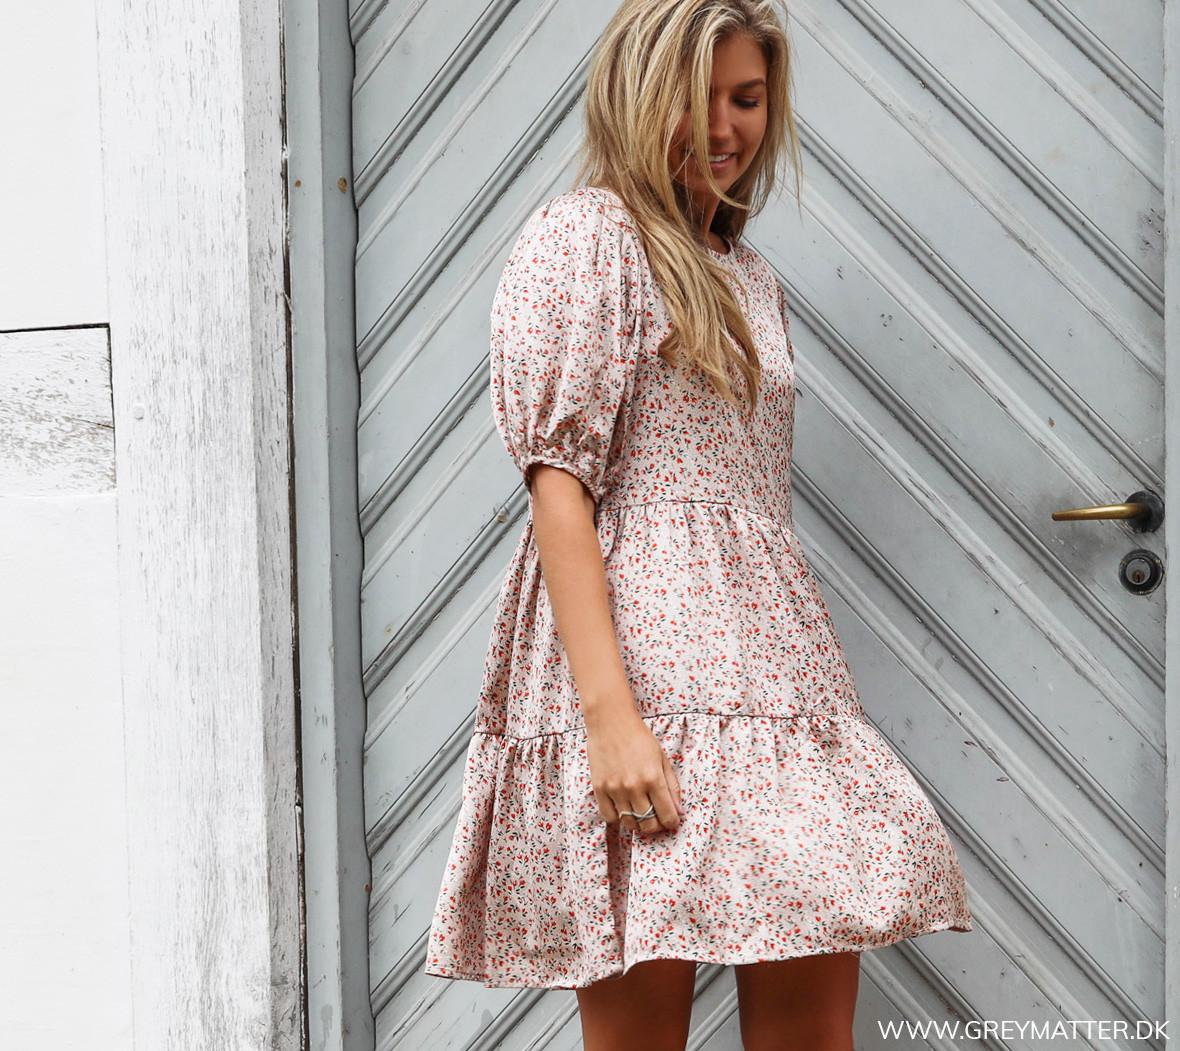 blog_bloggerlife_greymatter_fashion.jpg